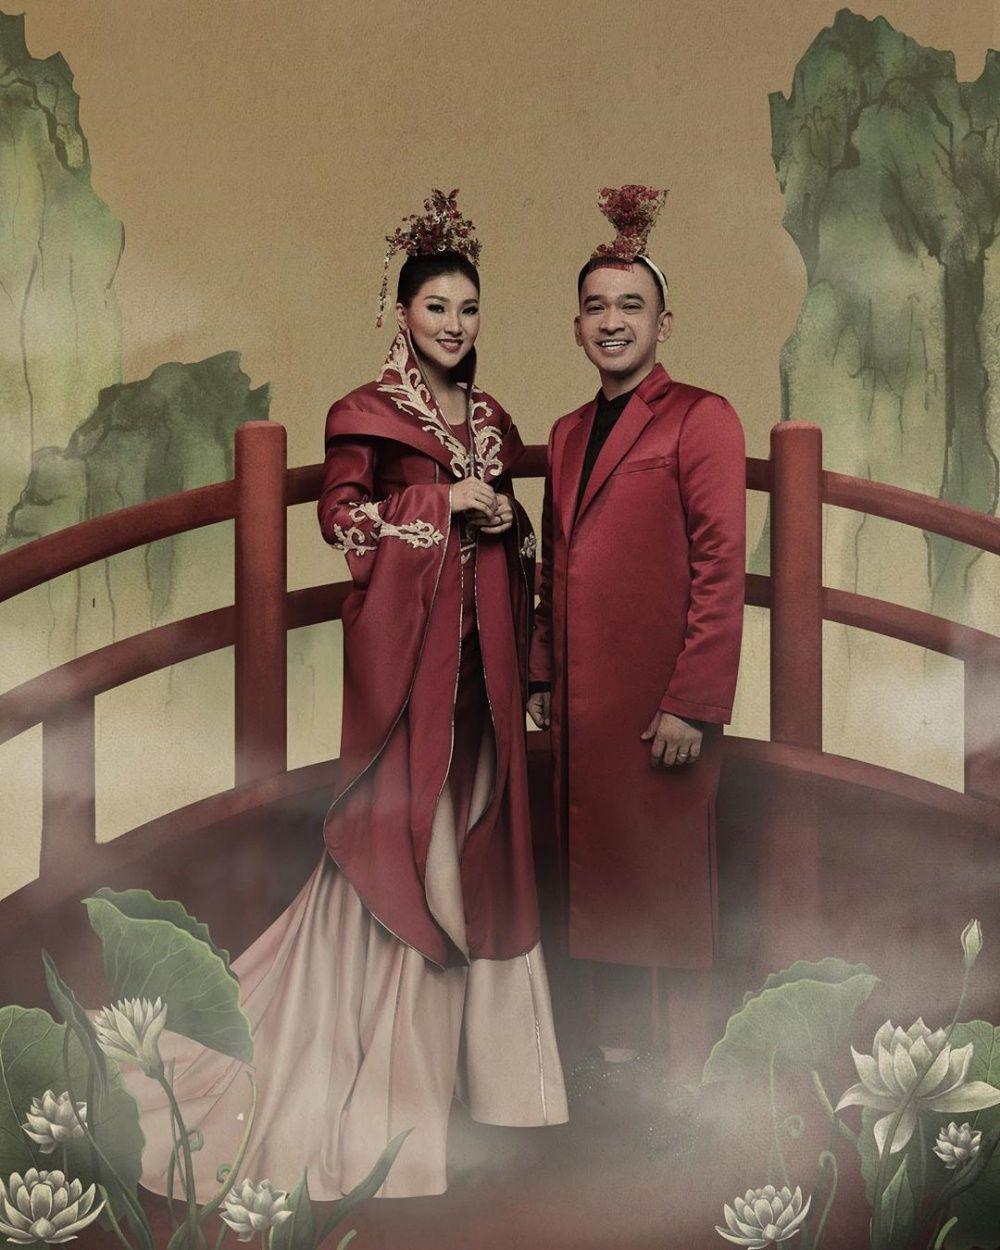 10 Potret Romantis Eks Girlband Bersama Suami Tercinta, Bikin Baper!